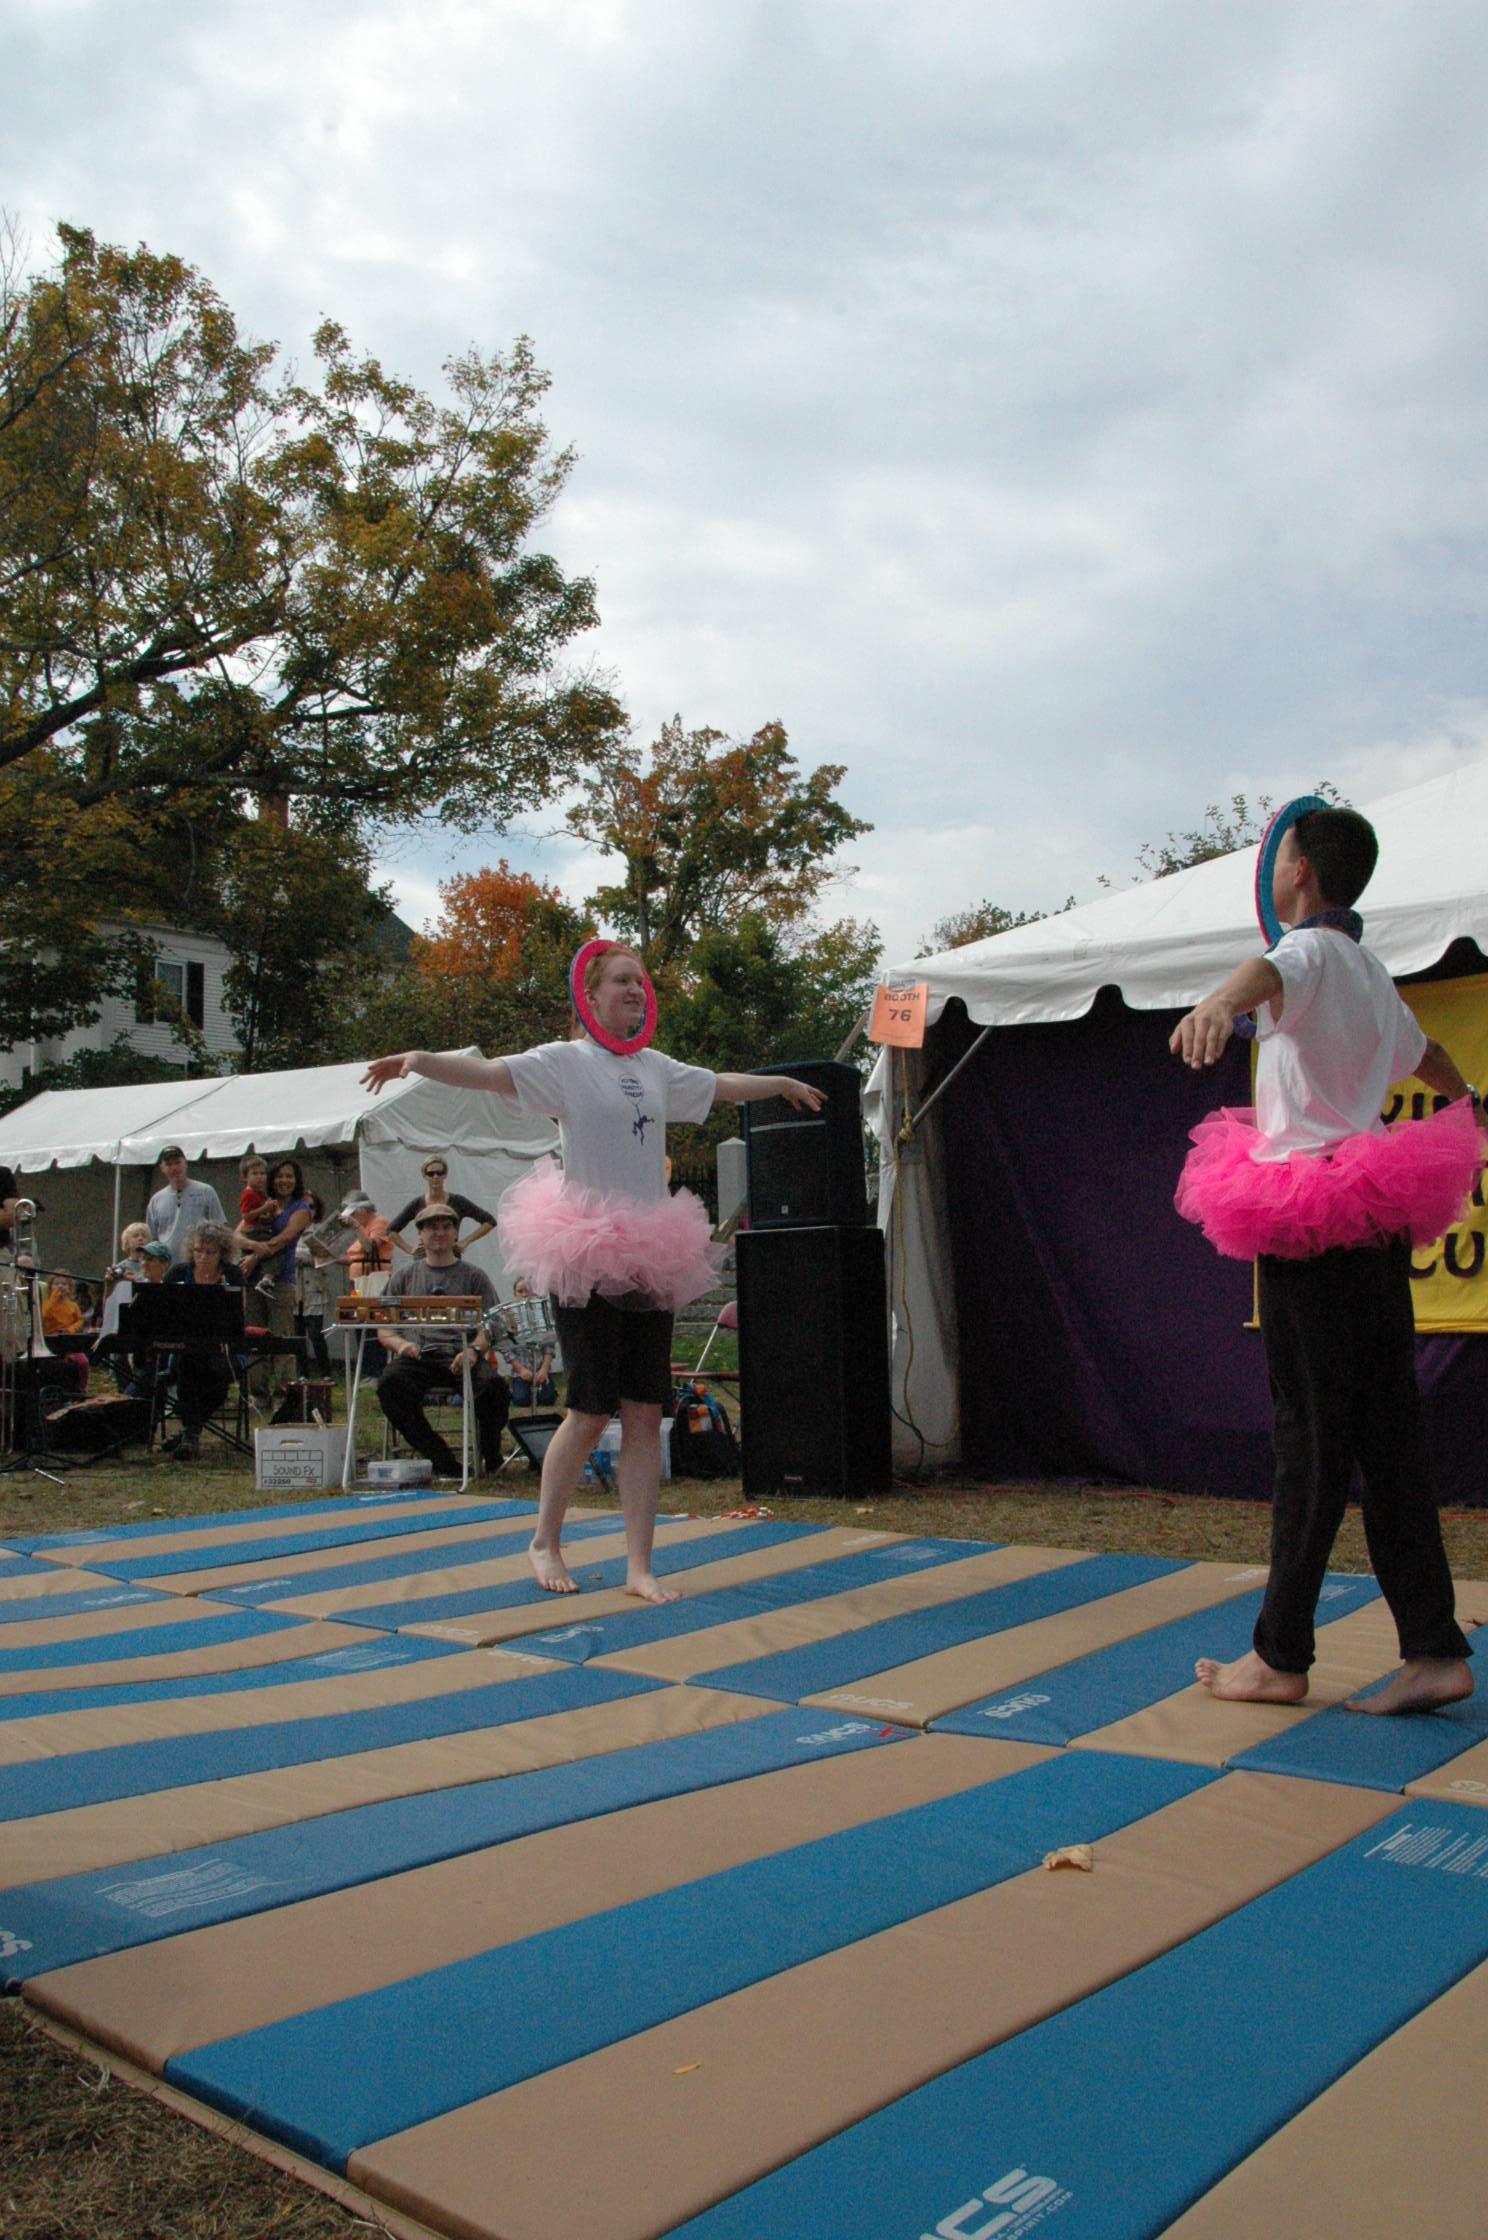 2012-10-06 Flyin Gravity Circus - Pumpkin 092.JPG